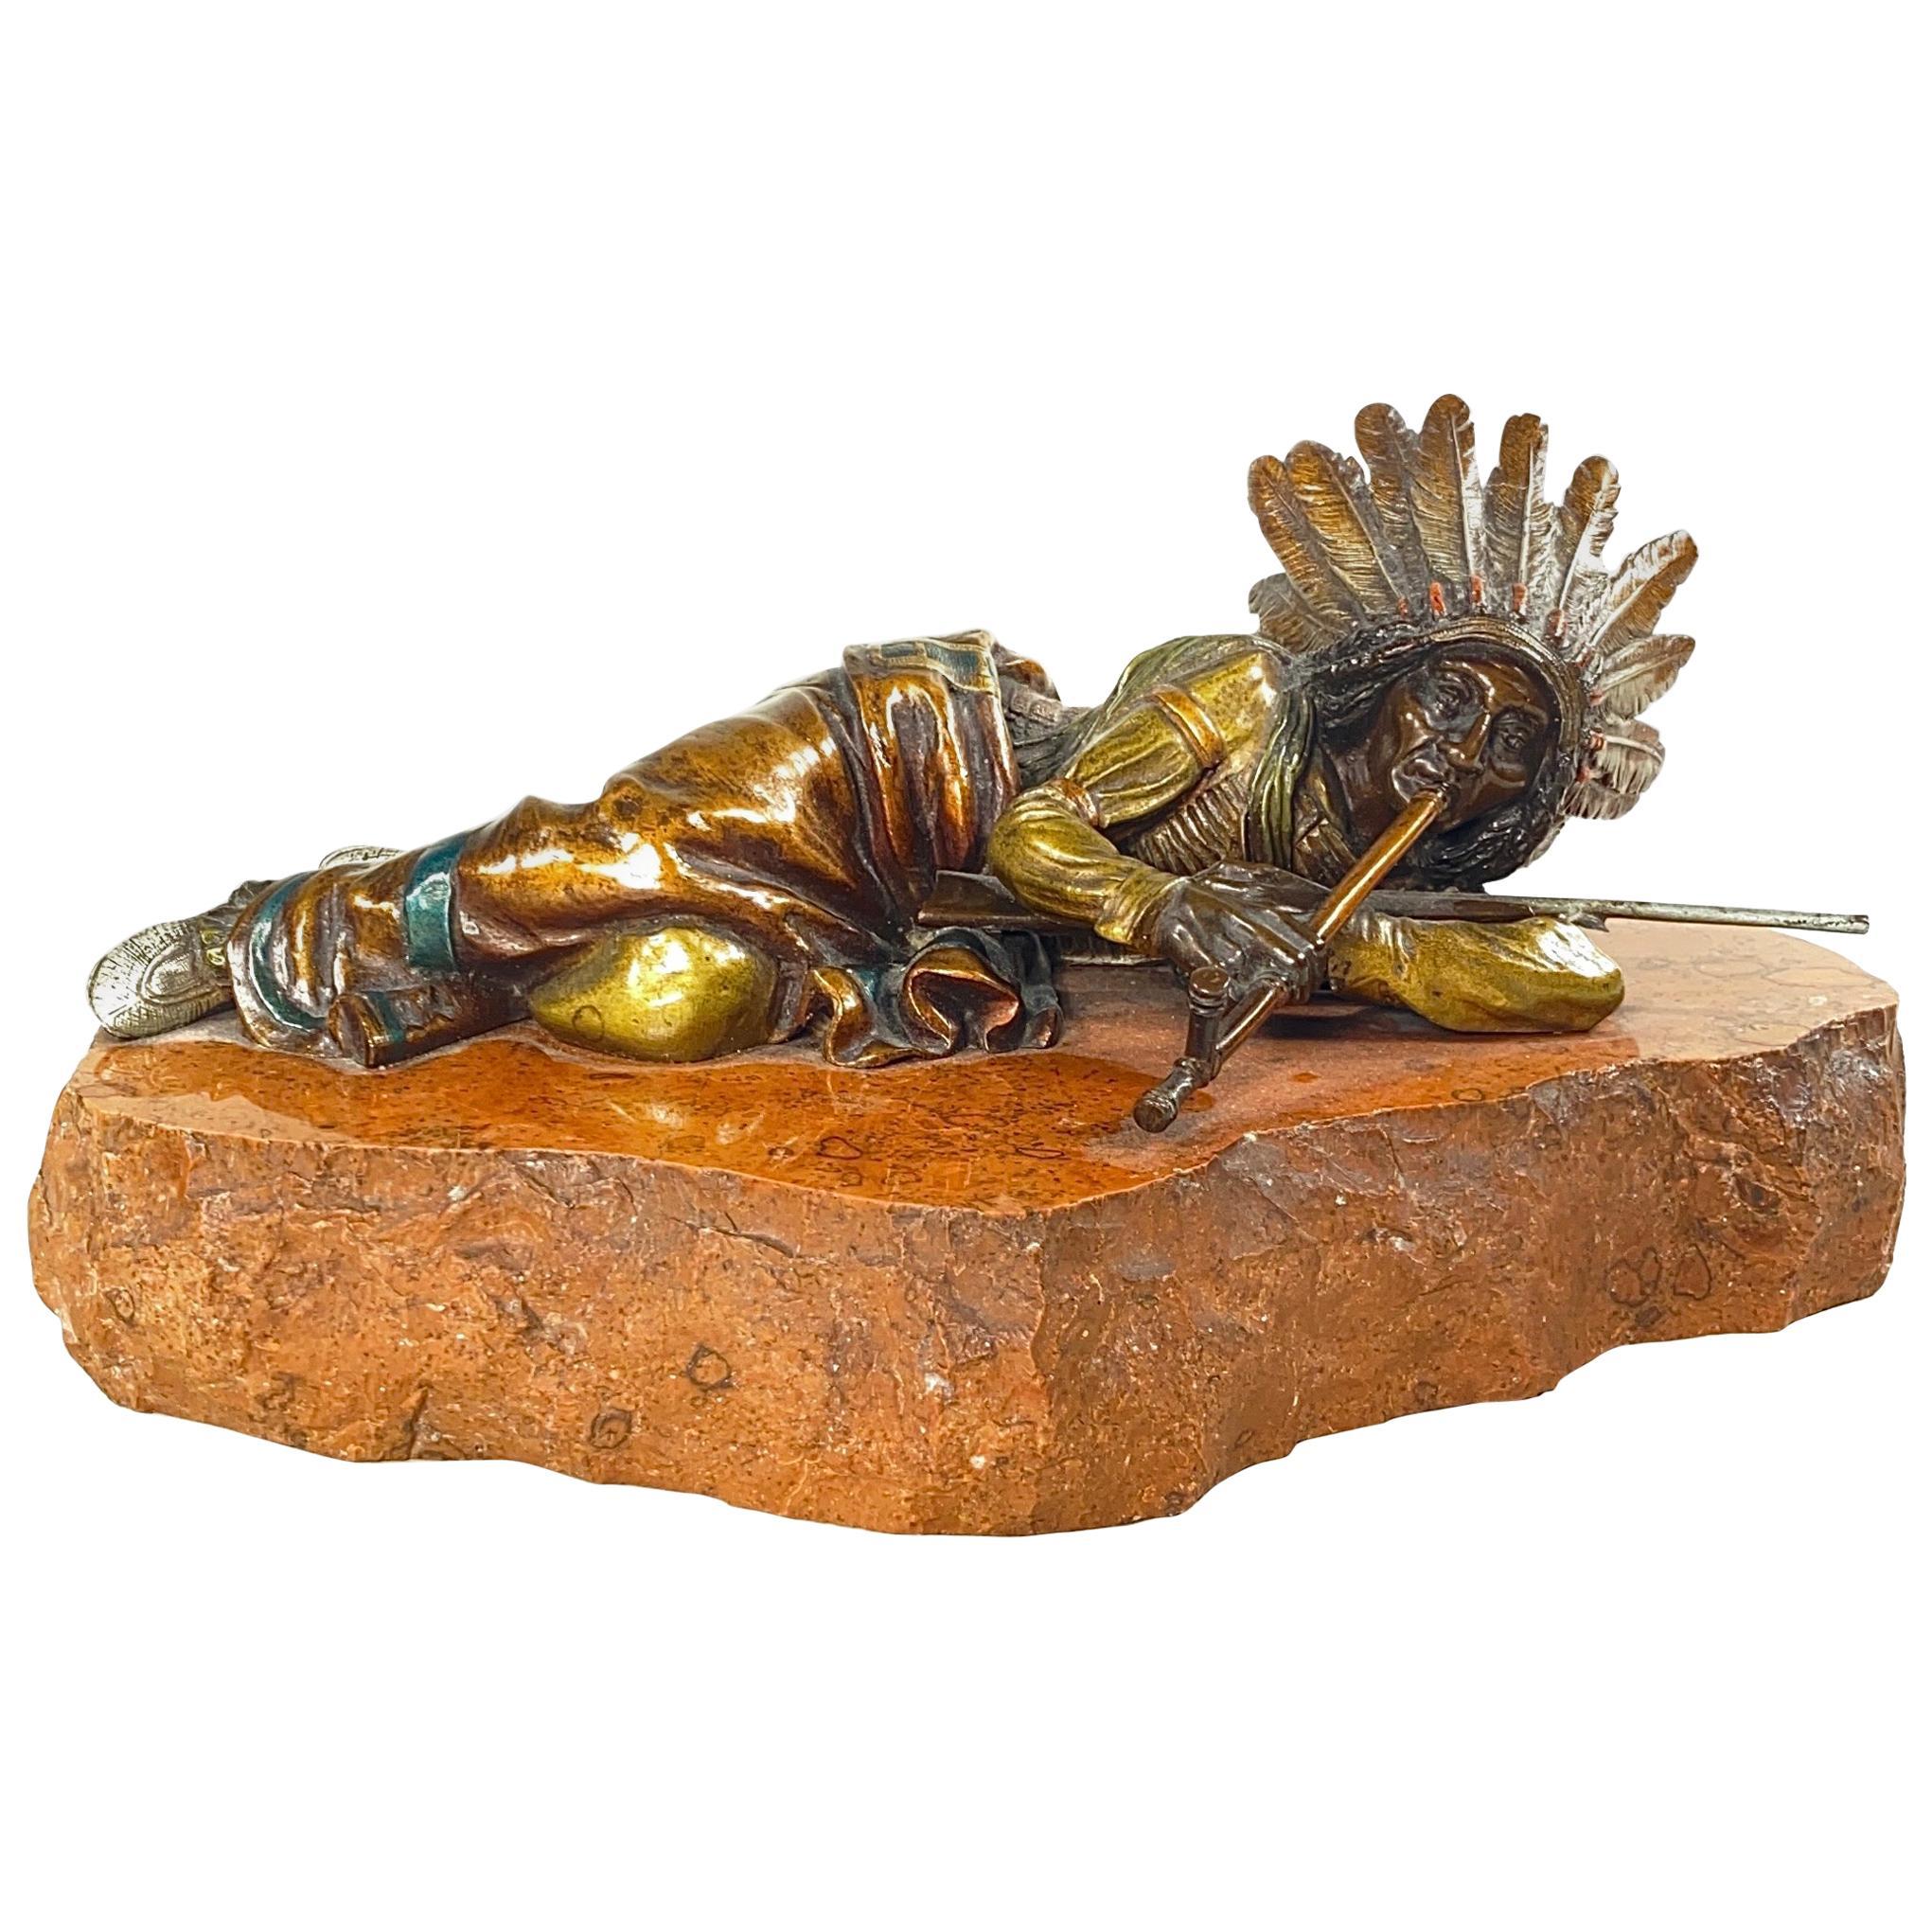 Austrian Bronze of Native American Indian Chief by, Carl Kauba